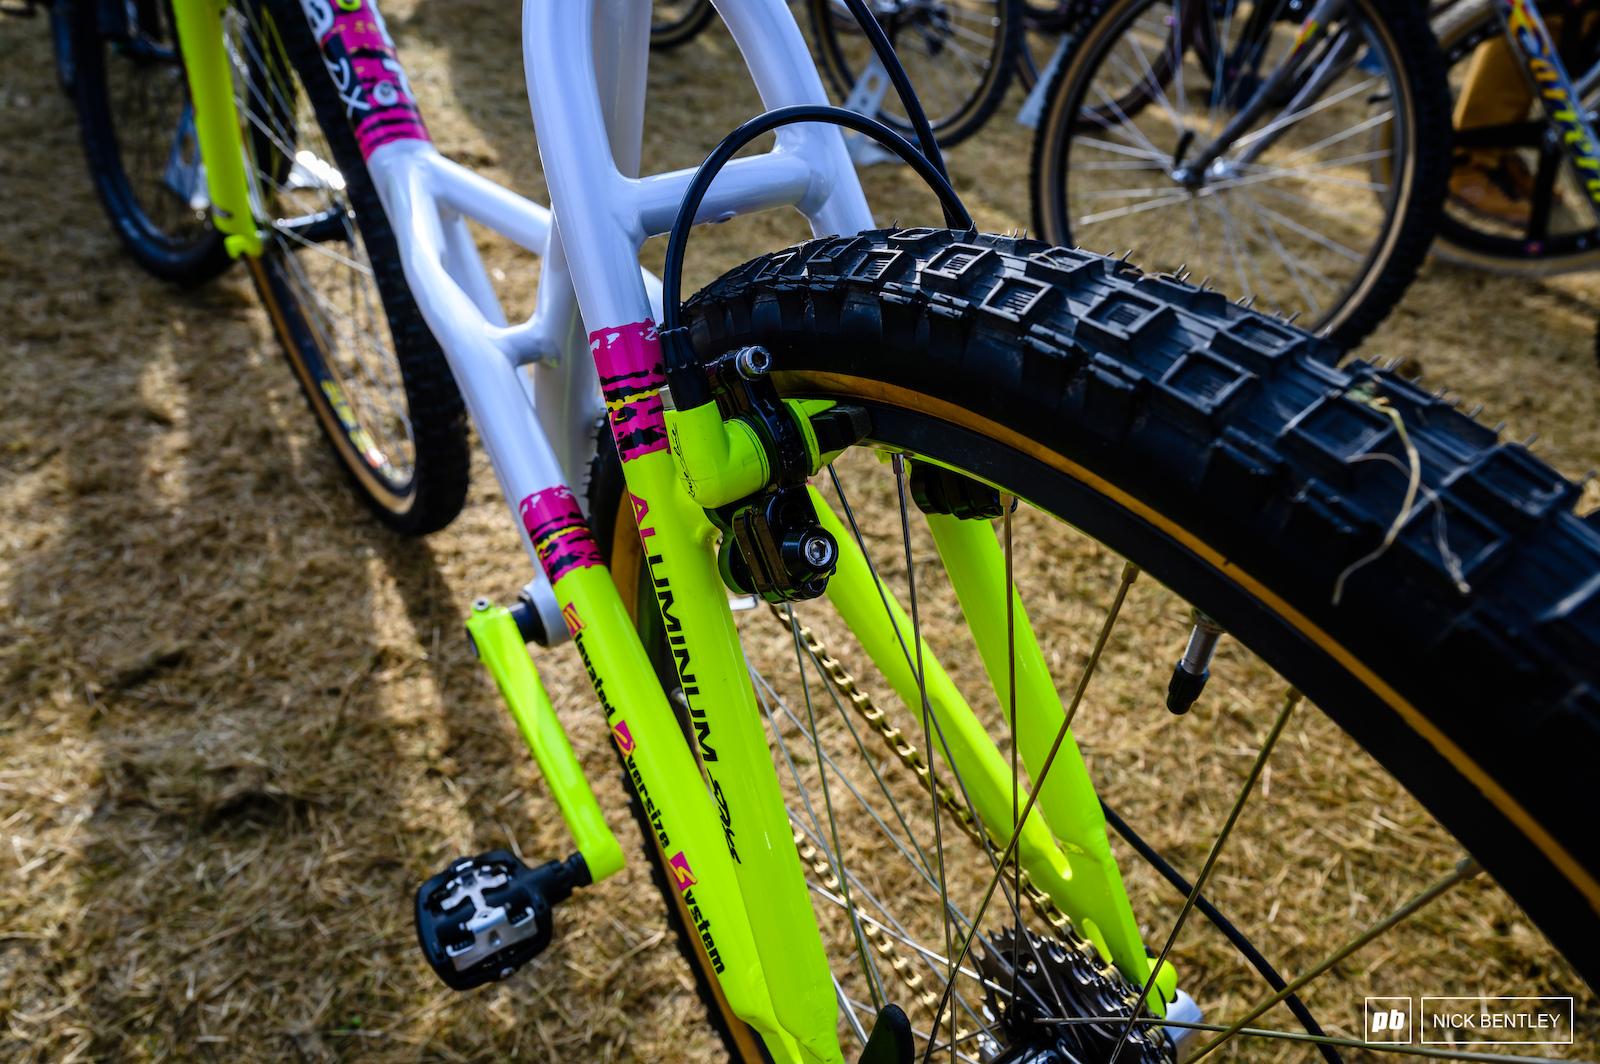 Yes those are original Alpinestars tyres